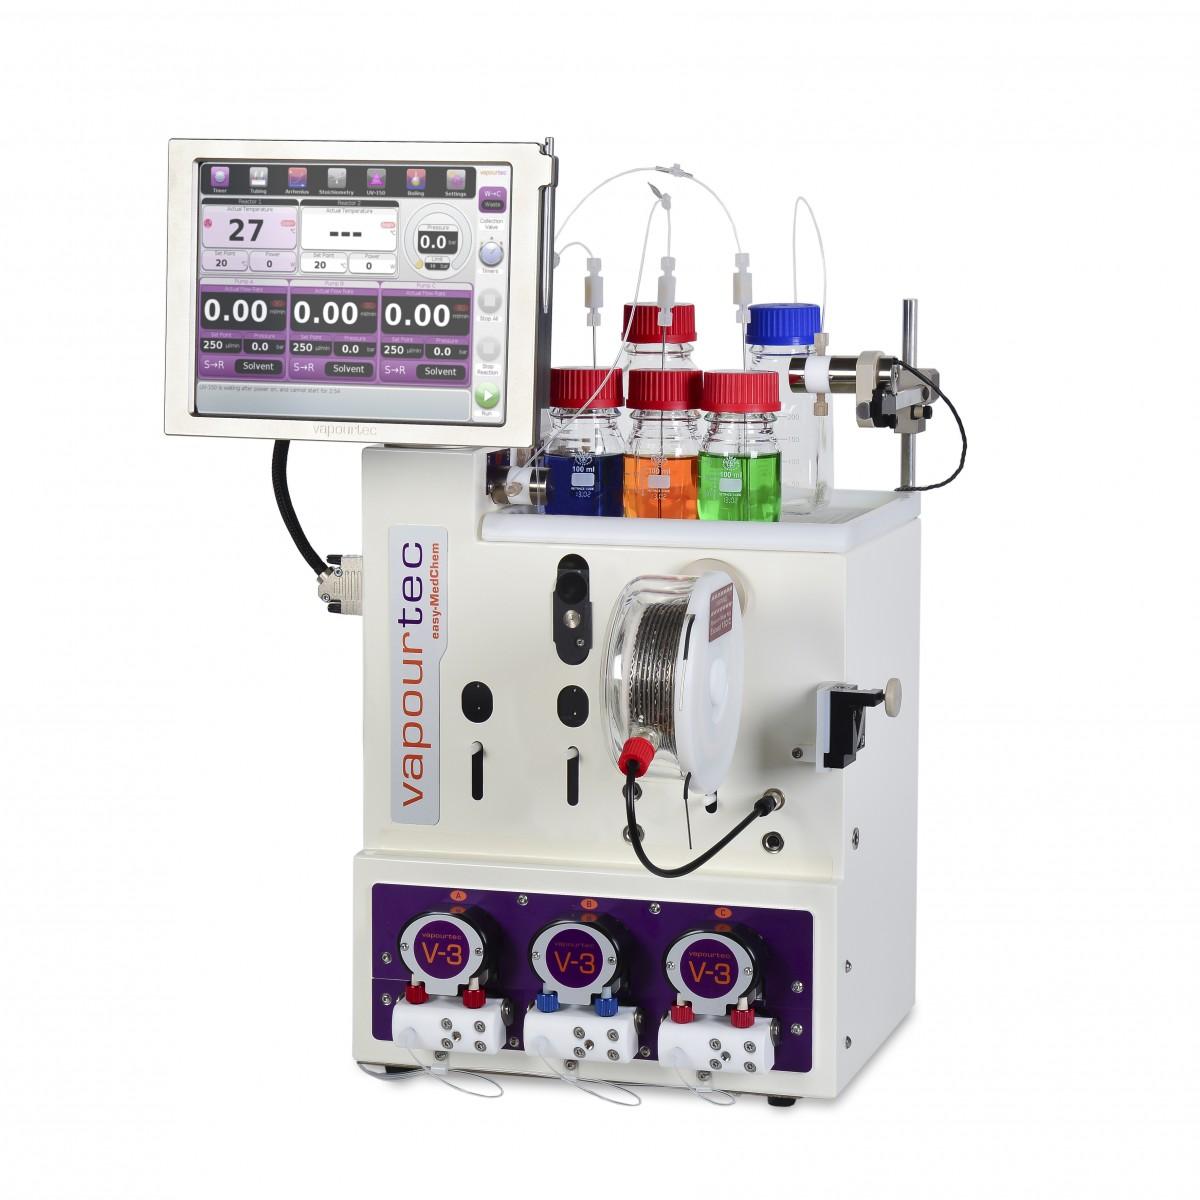 Vapourtec - easy-polymer-flow-reactor